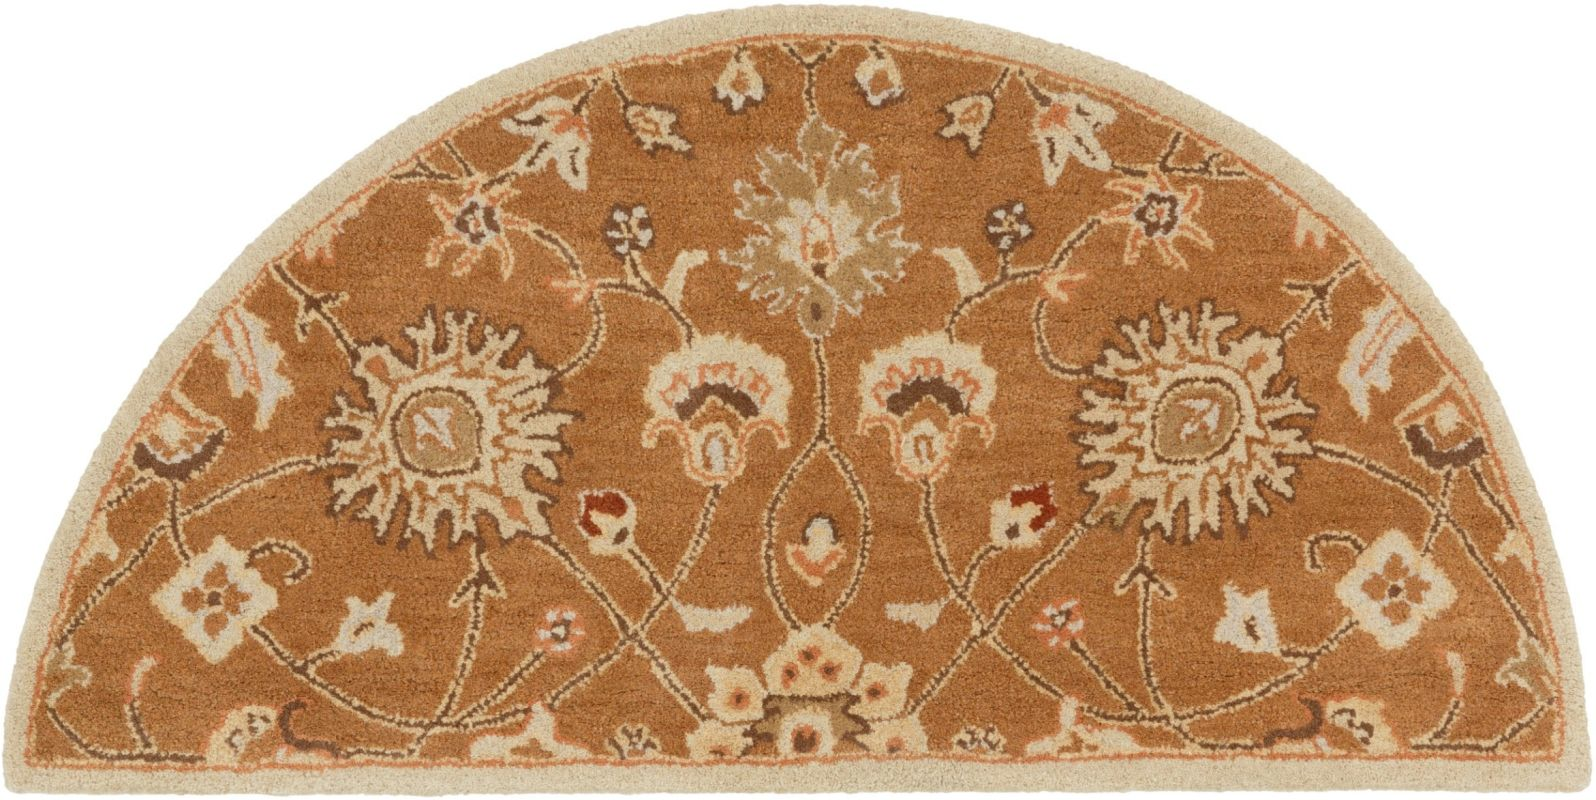 Surya CAE-1120 Caesar Hand Tufted Wool Rug Brown 2 x 4 Hearth Home